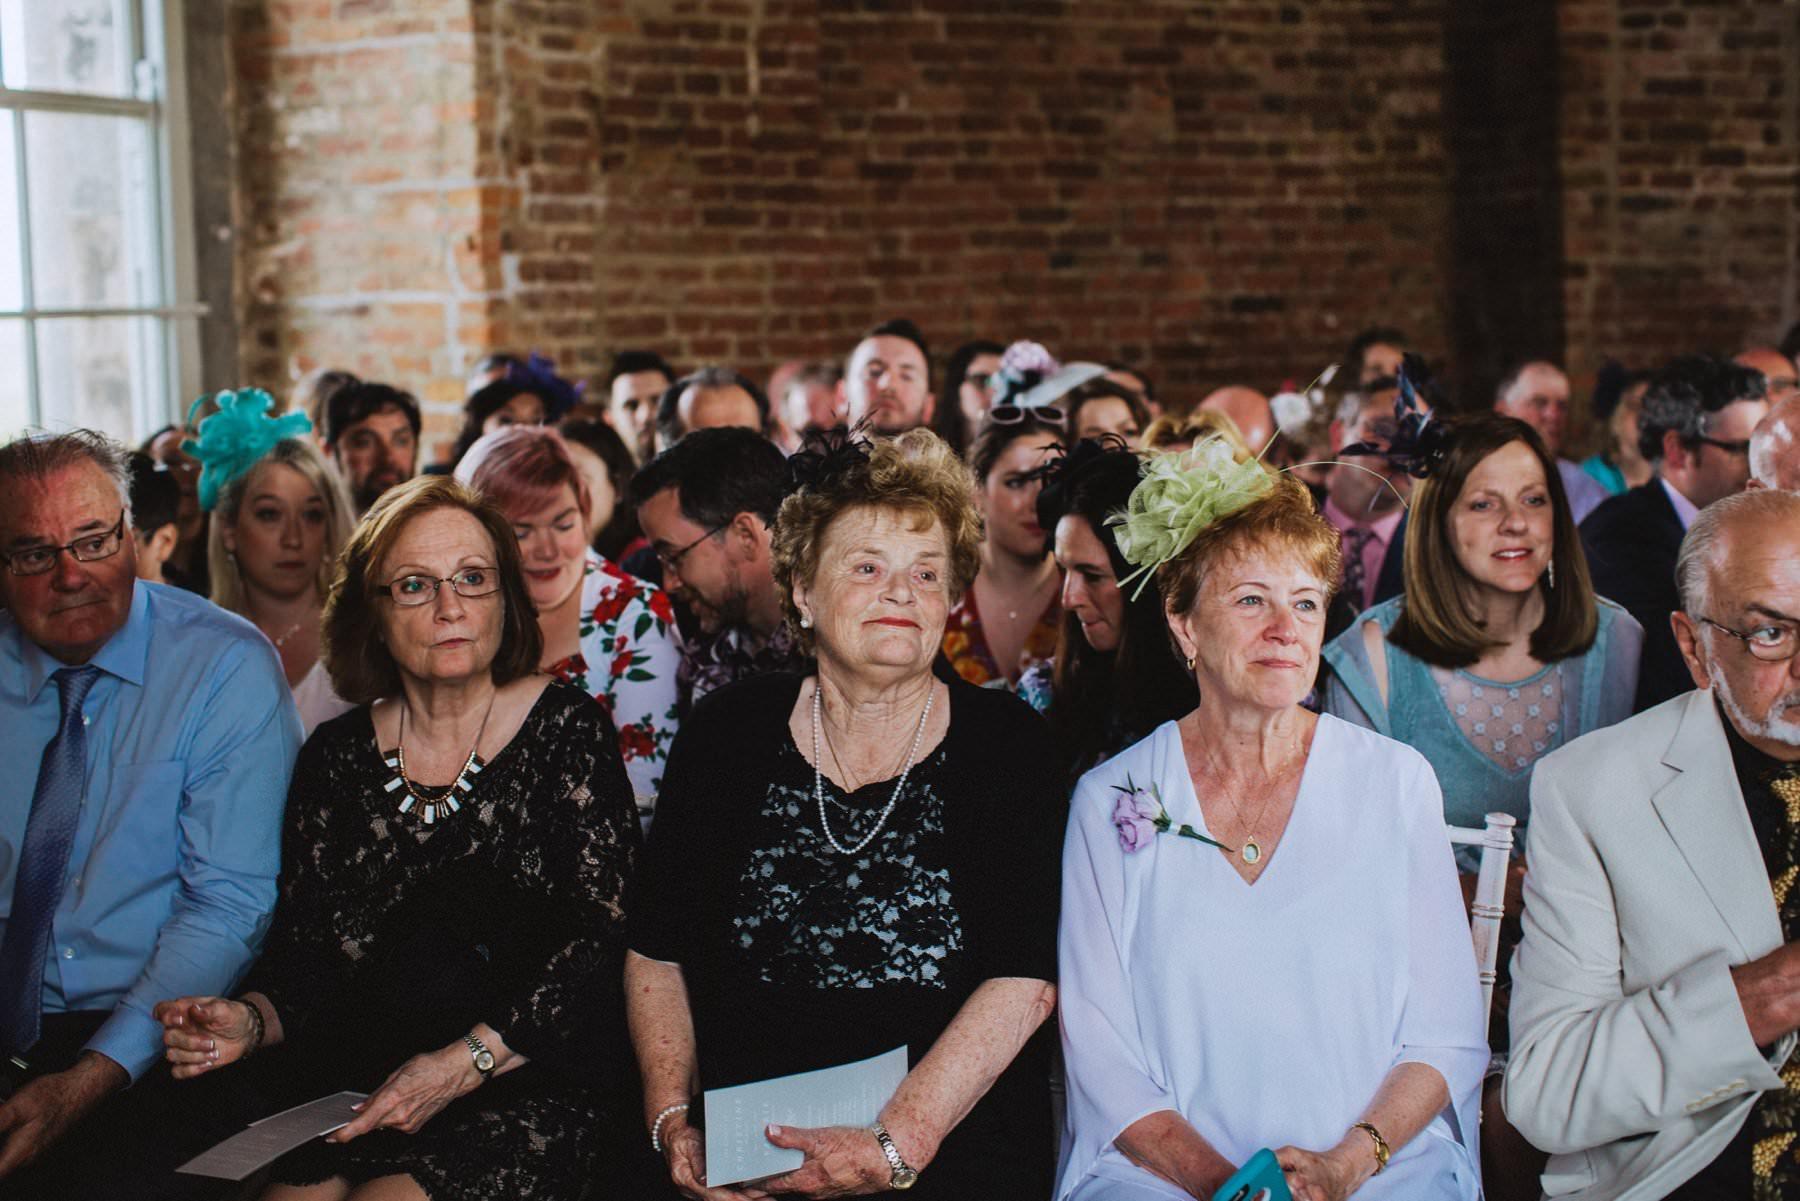 unique wedding ceremony at mussenden temple northern ireland